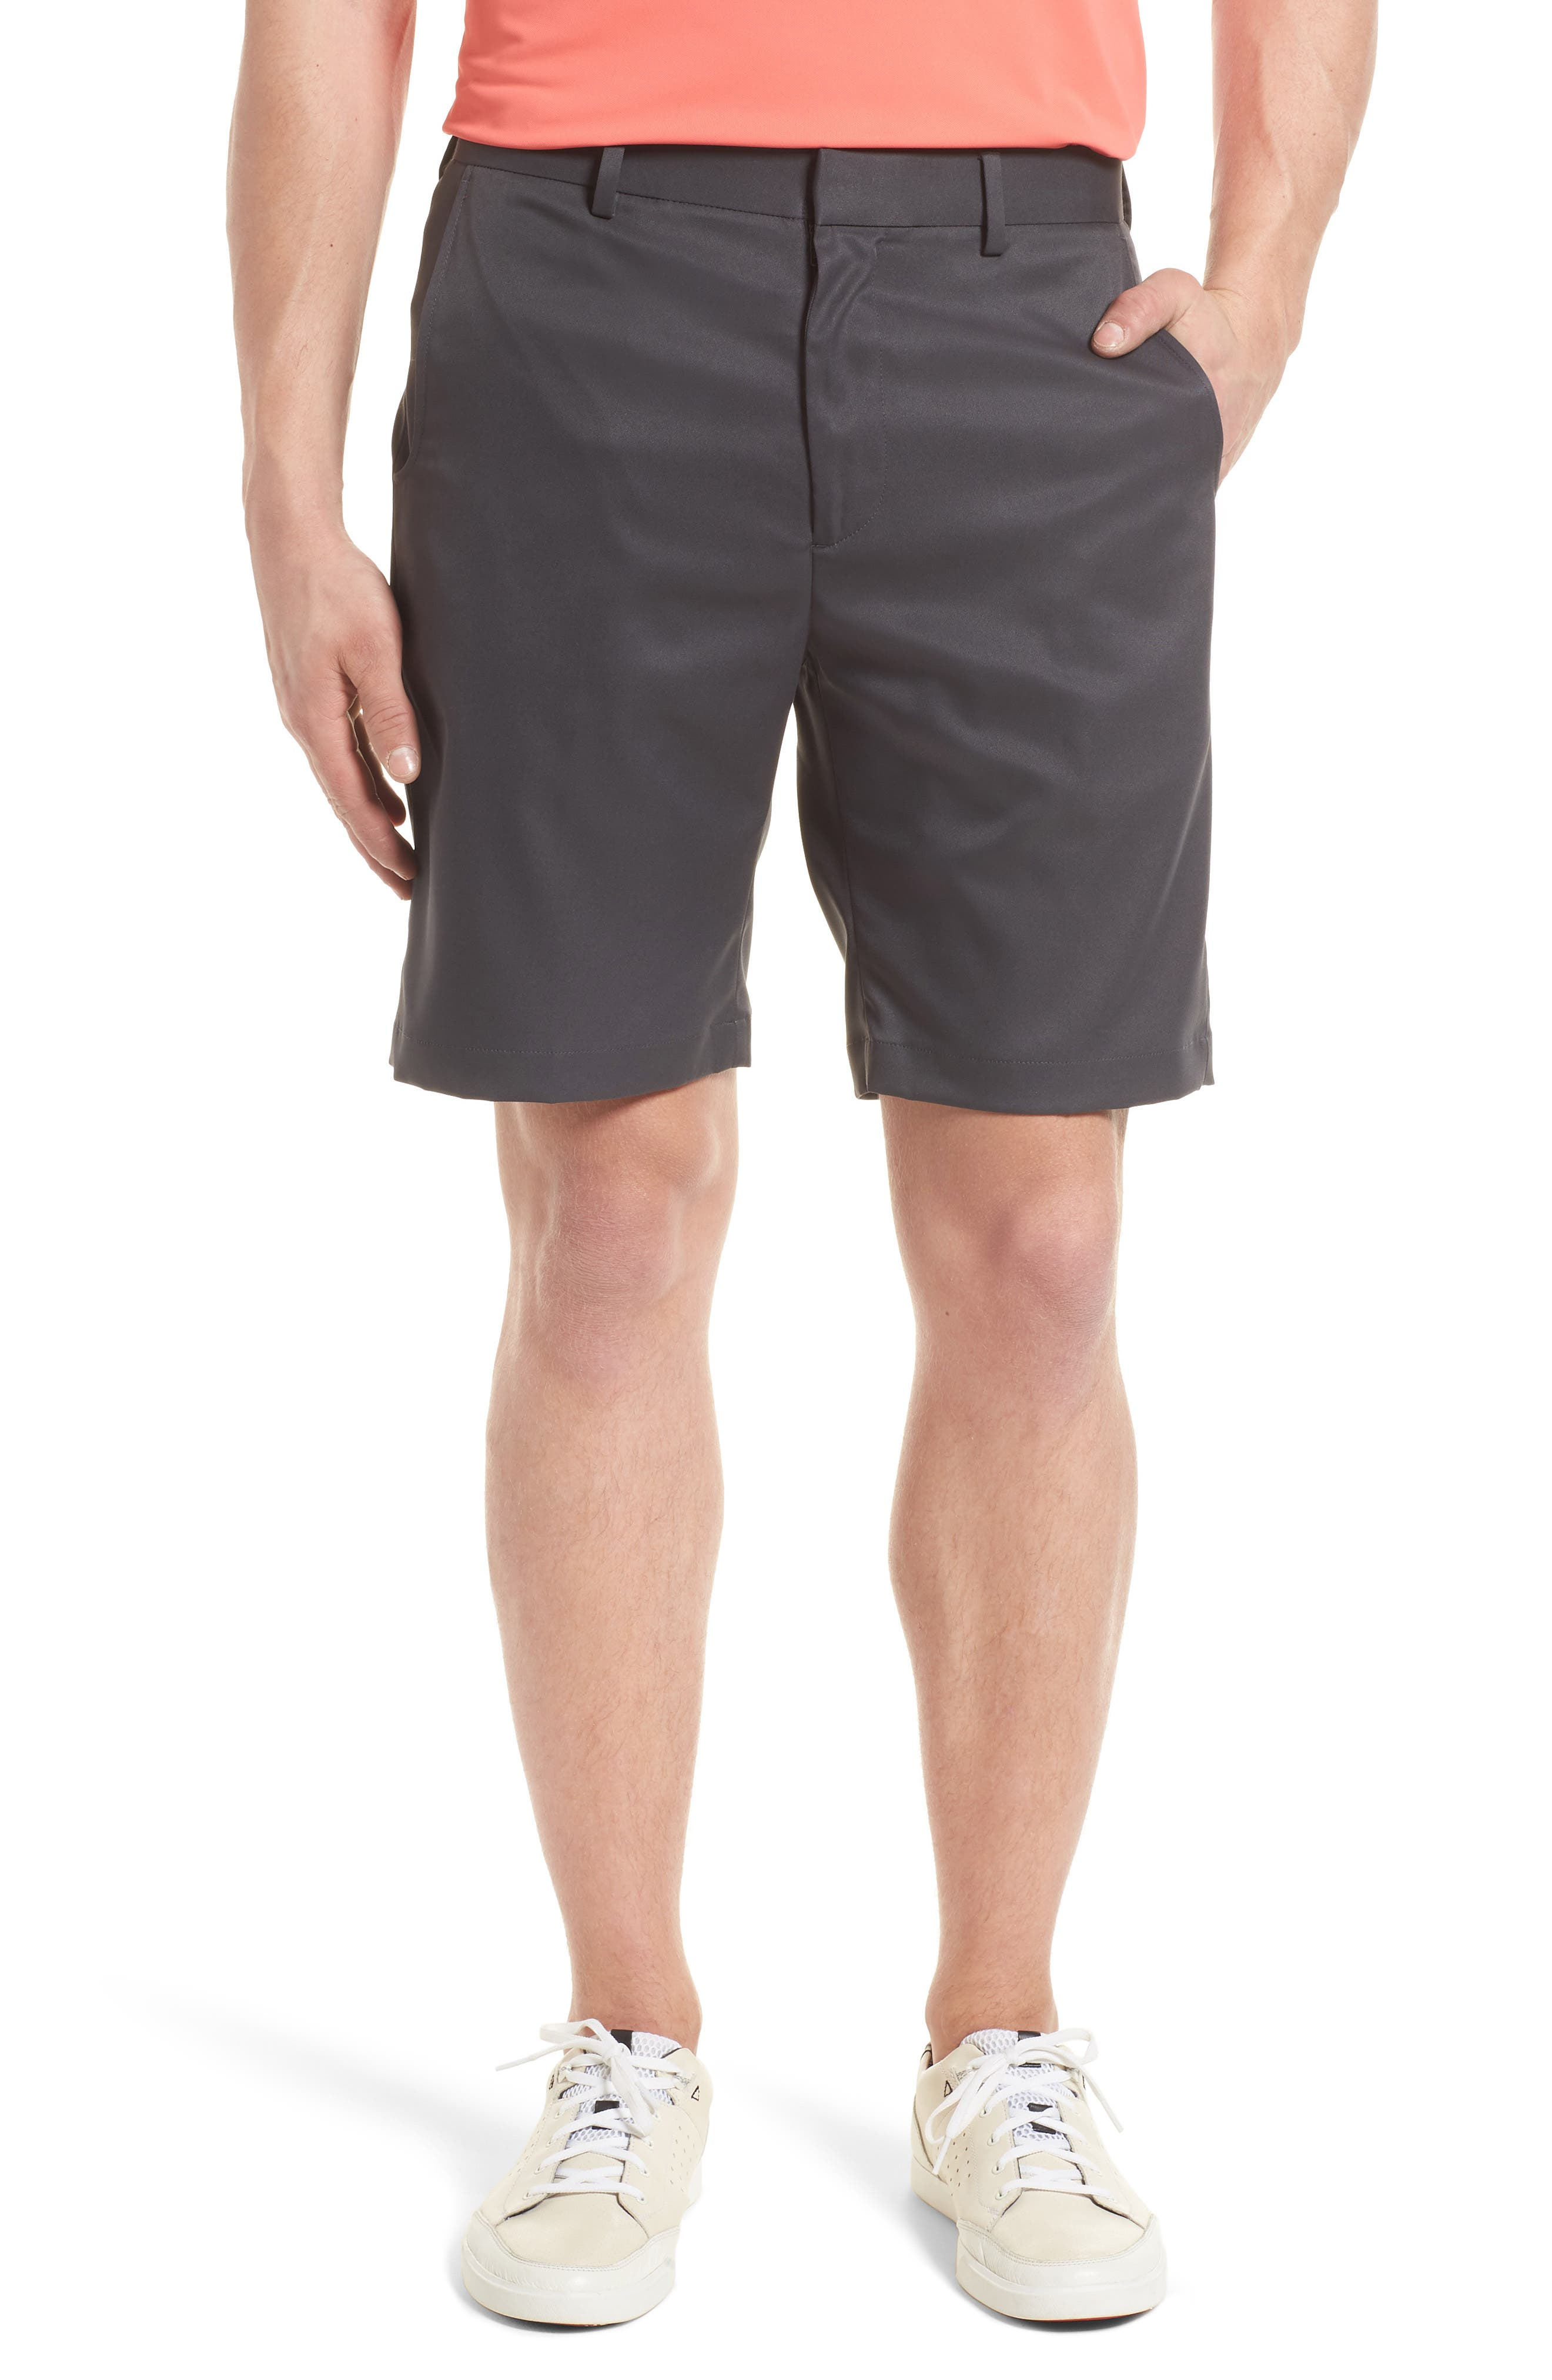 BOBBY JONES, Flat Front Tech Shorts, Main thumbnail 1, color, CHARCOAL